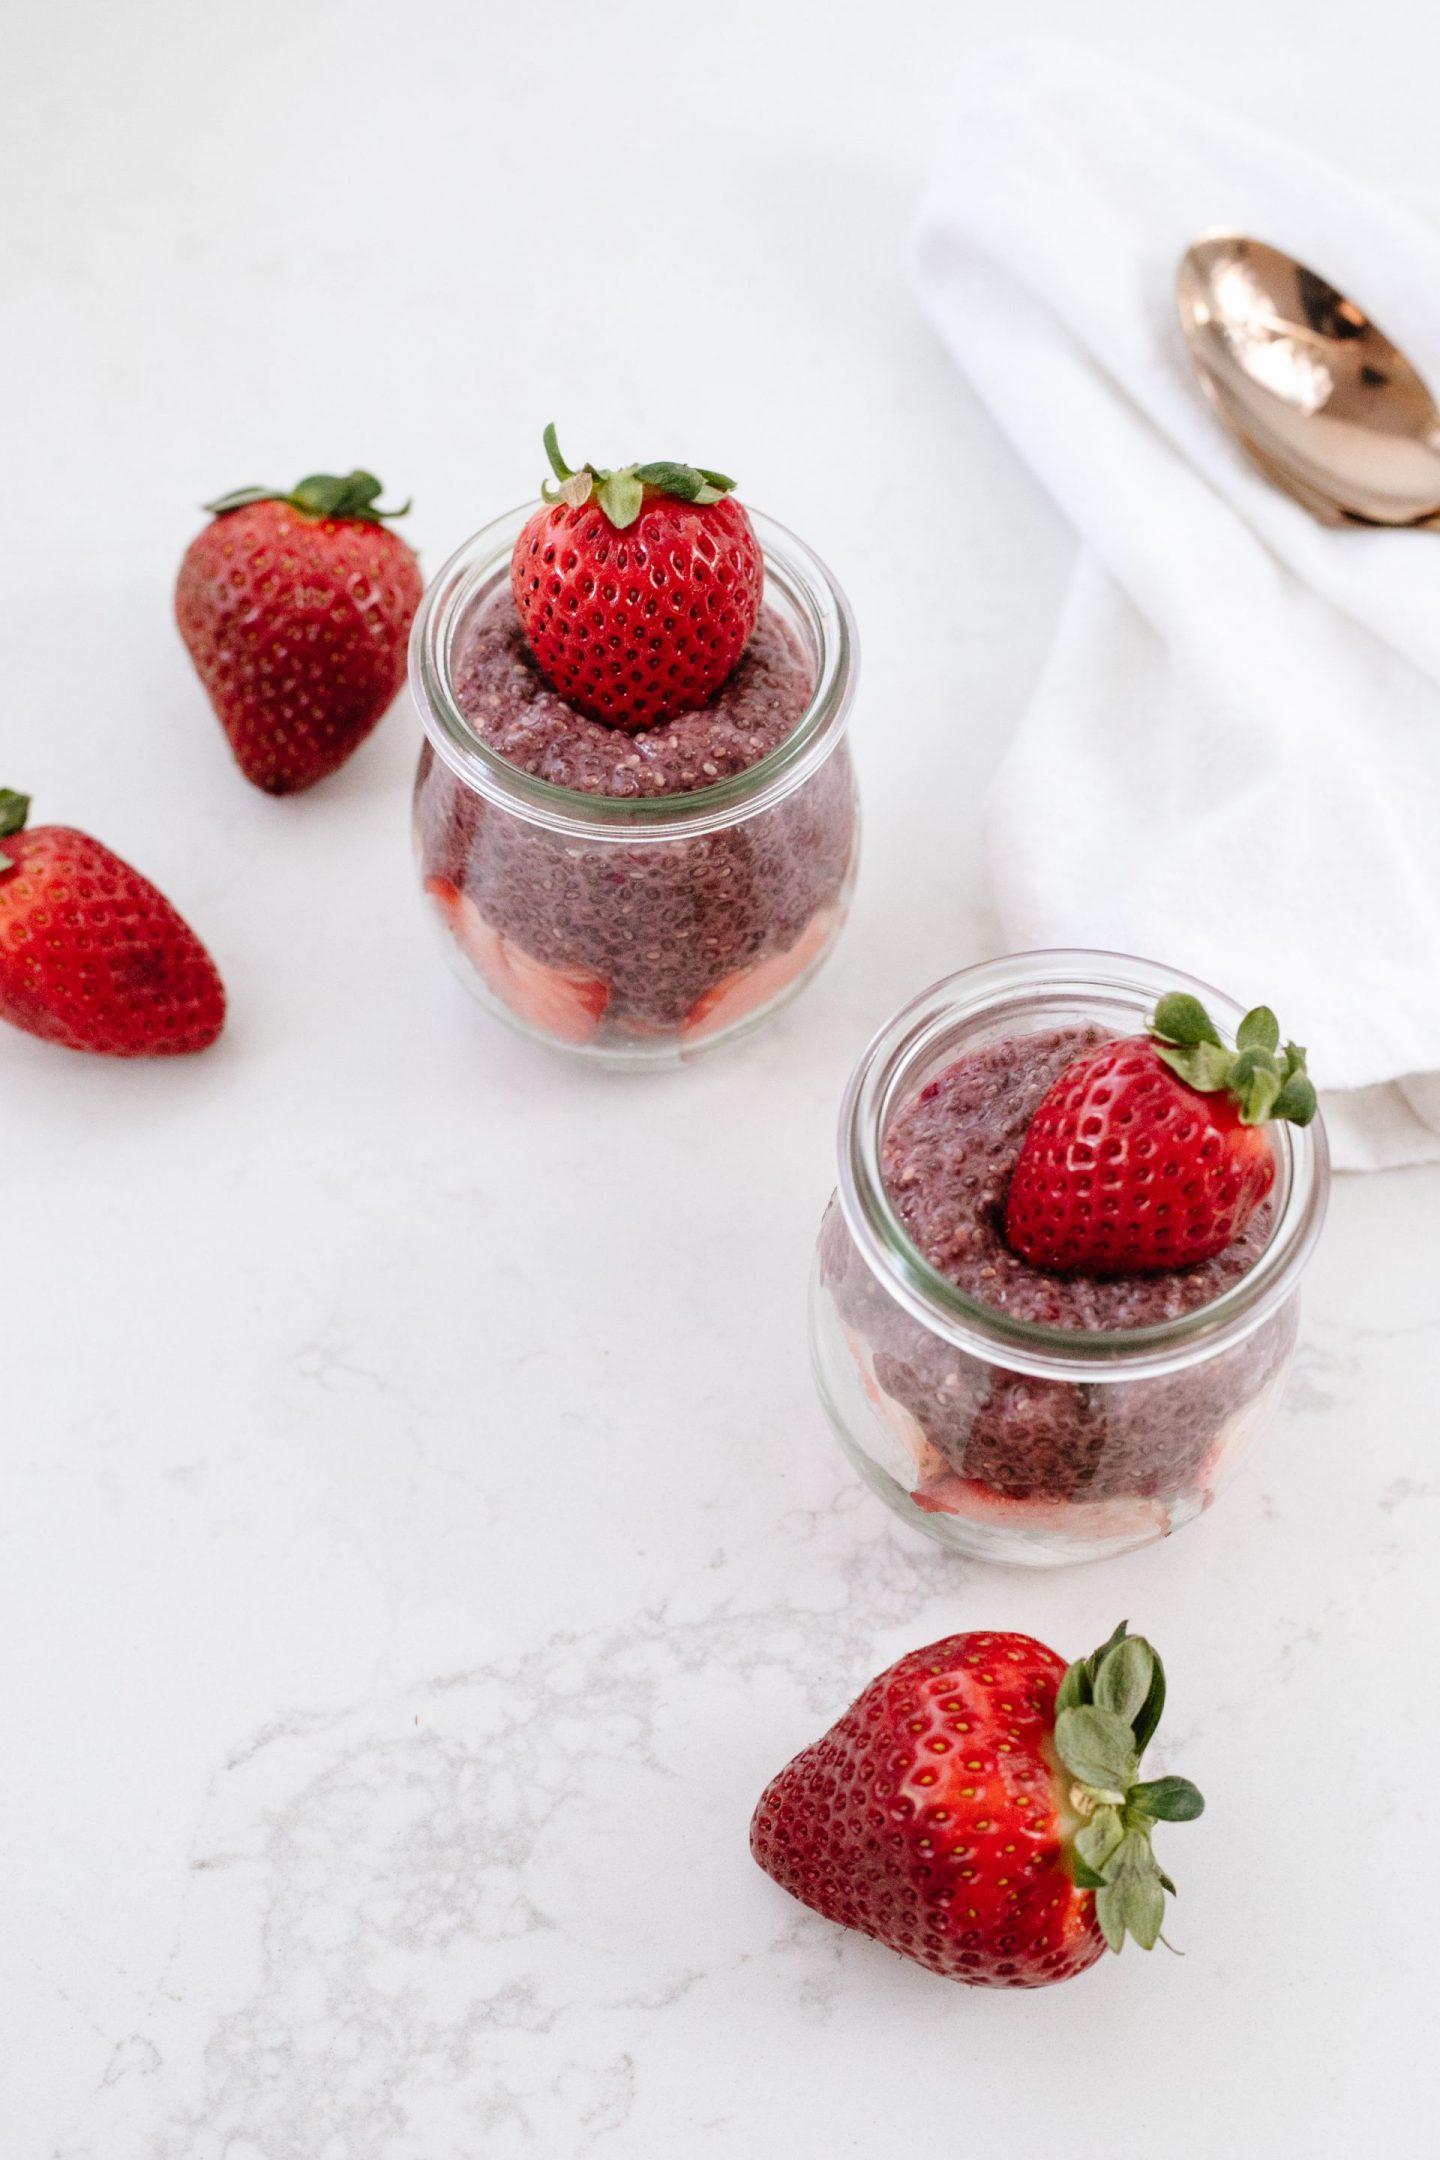 Easy Strawberry Chia Pudding